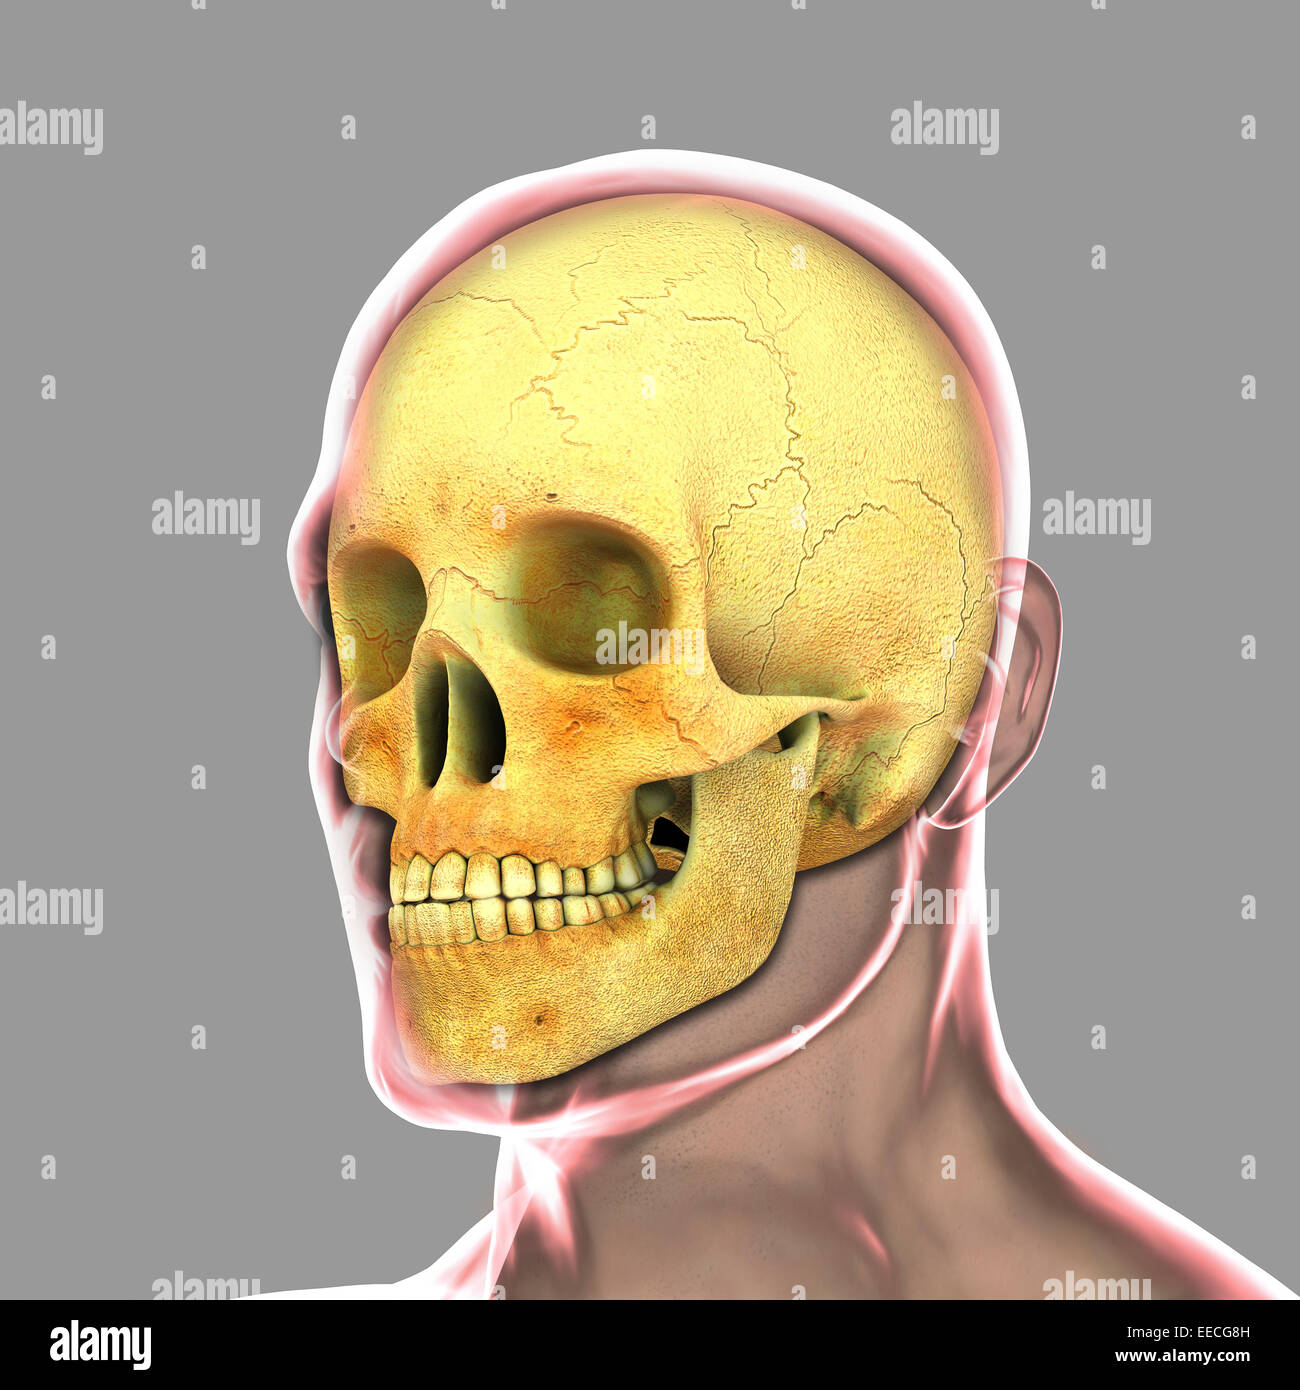 Human skull. - Stock Image